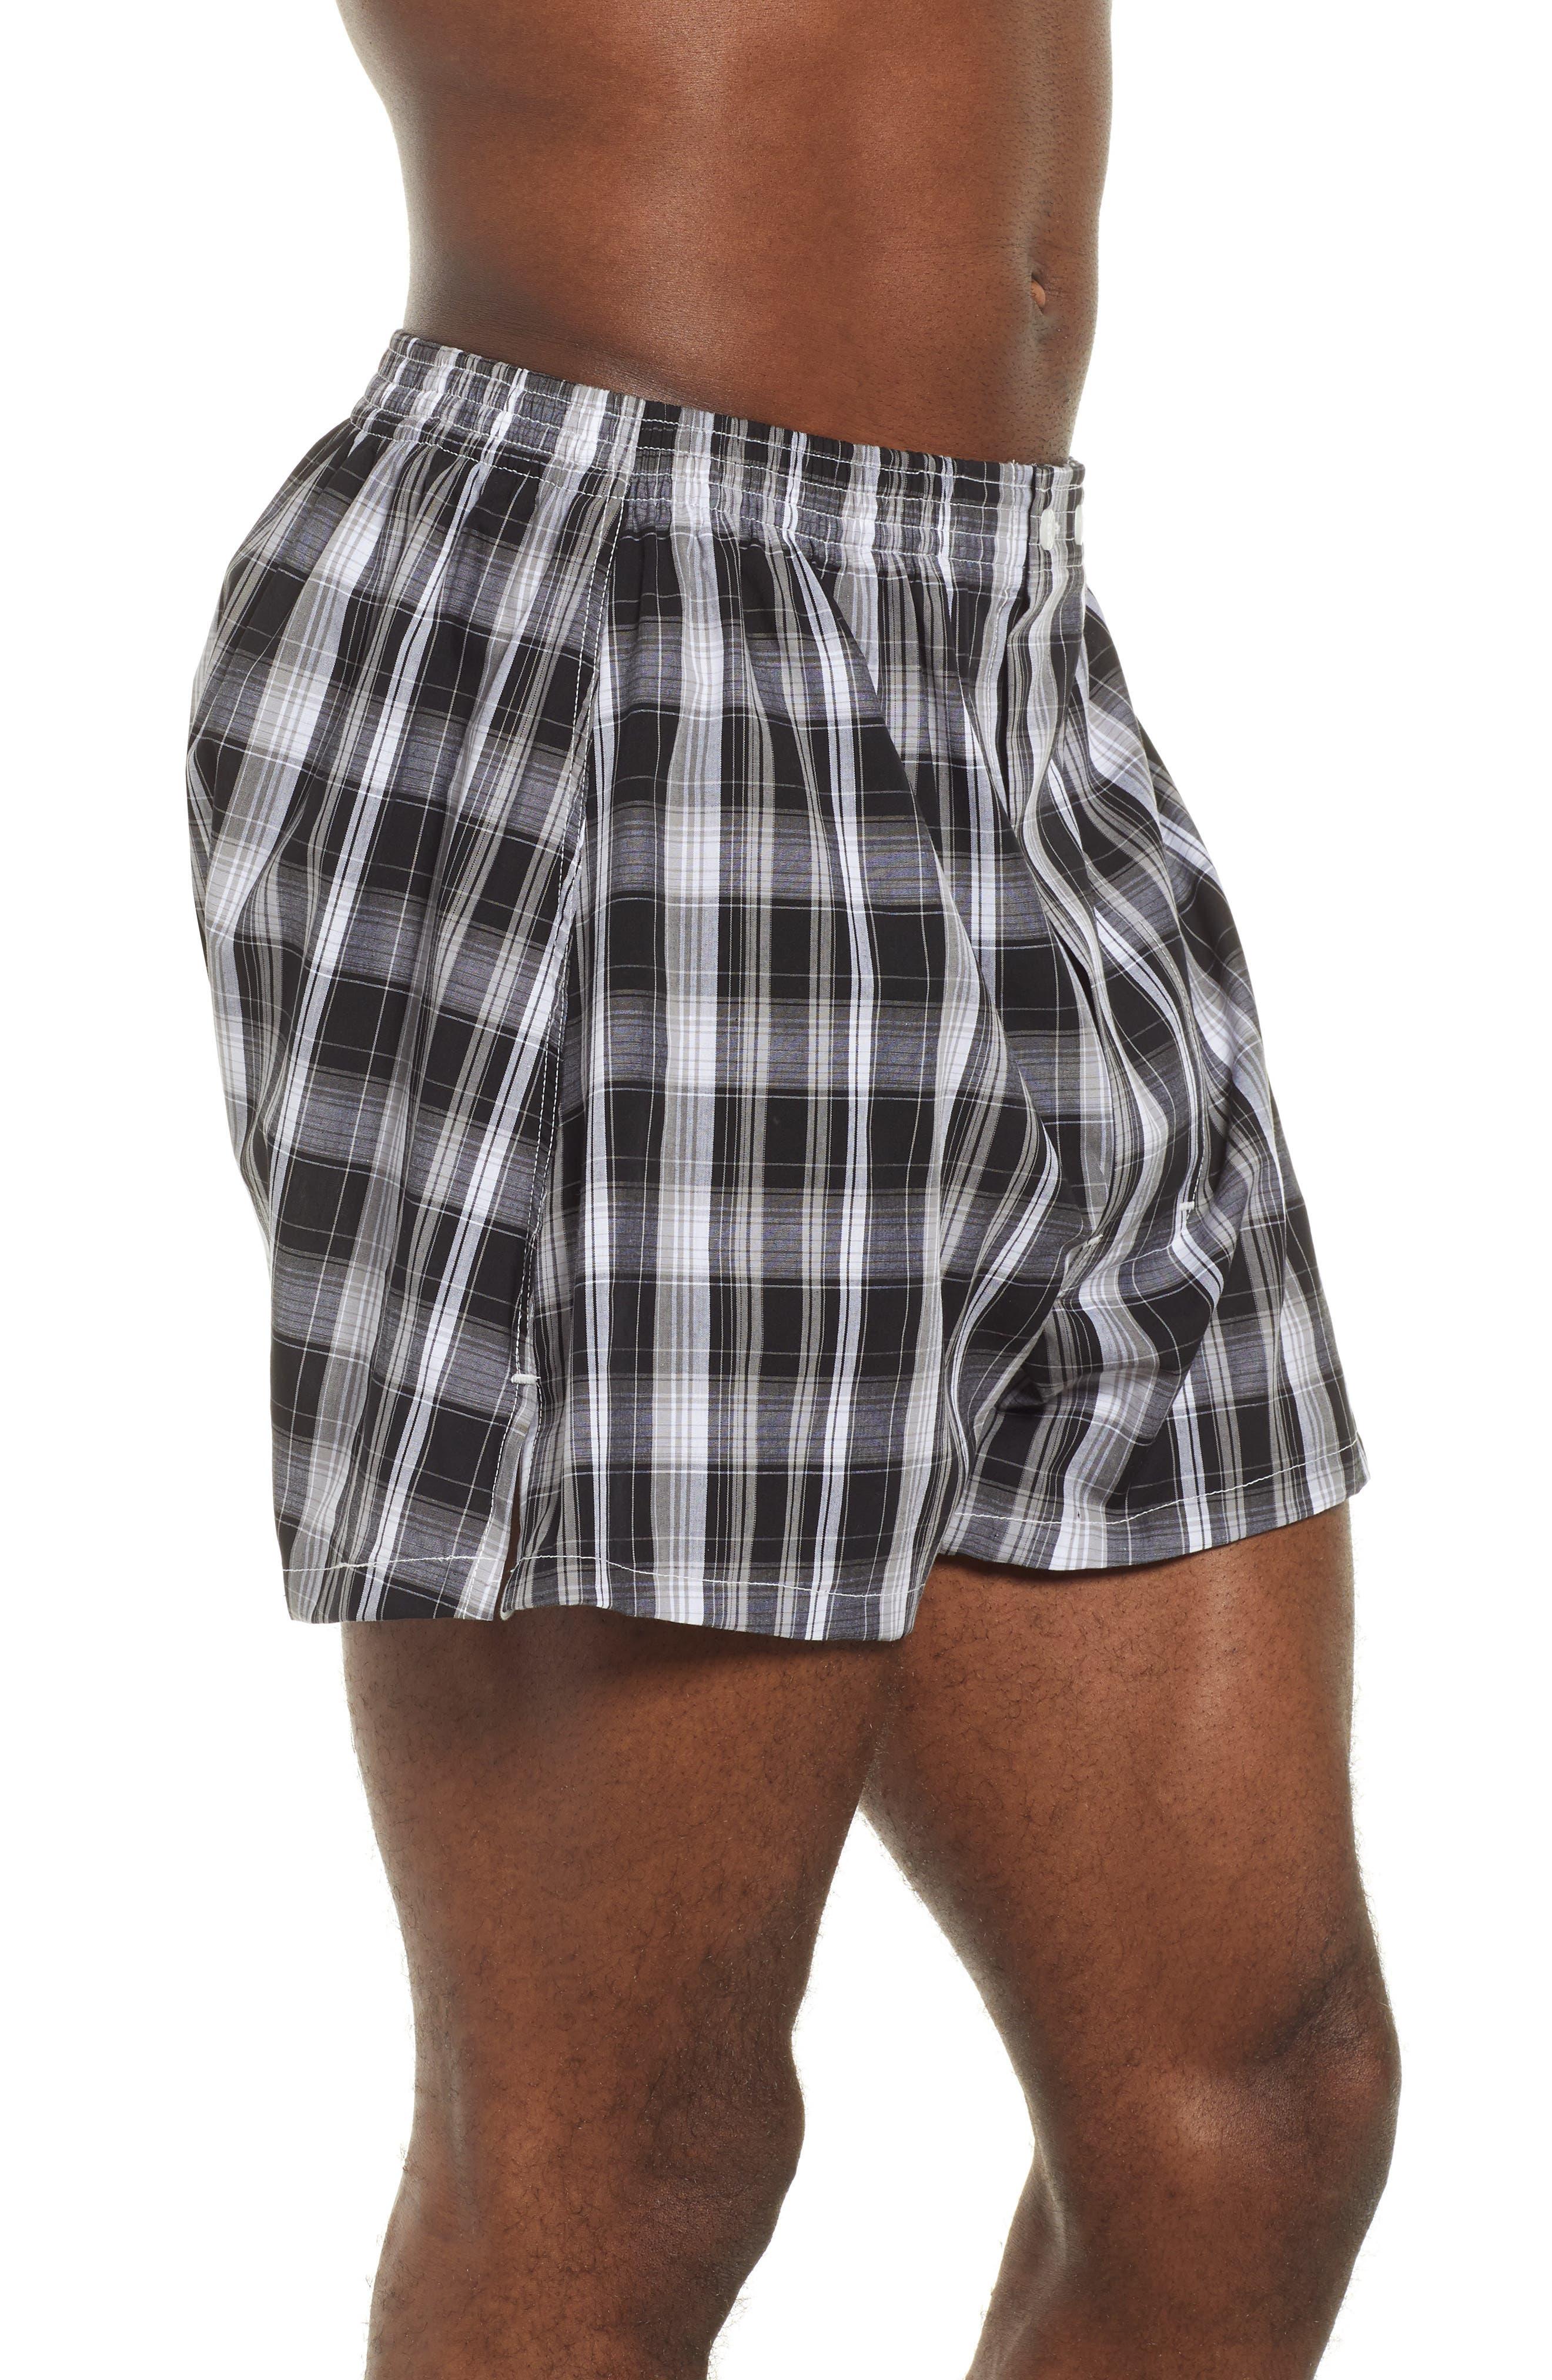 NORDSTROM MEN'S SHOP, 3-Pack Classic Fit Boxers, Alternate thumbnail 4, color, BLACK- WHITE PLAID PACK